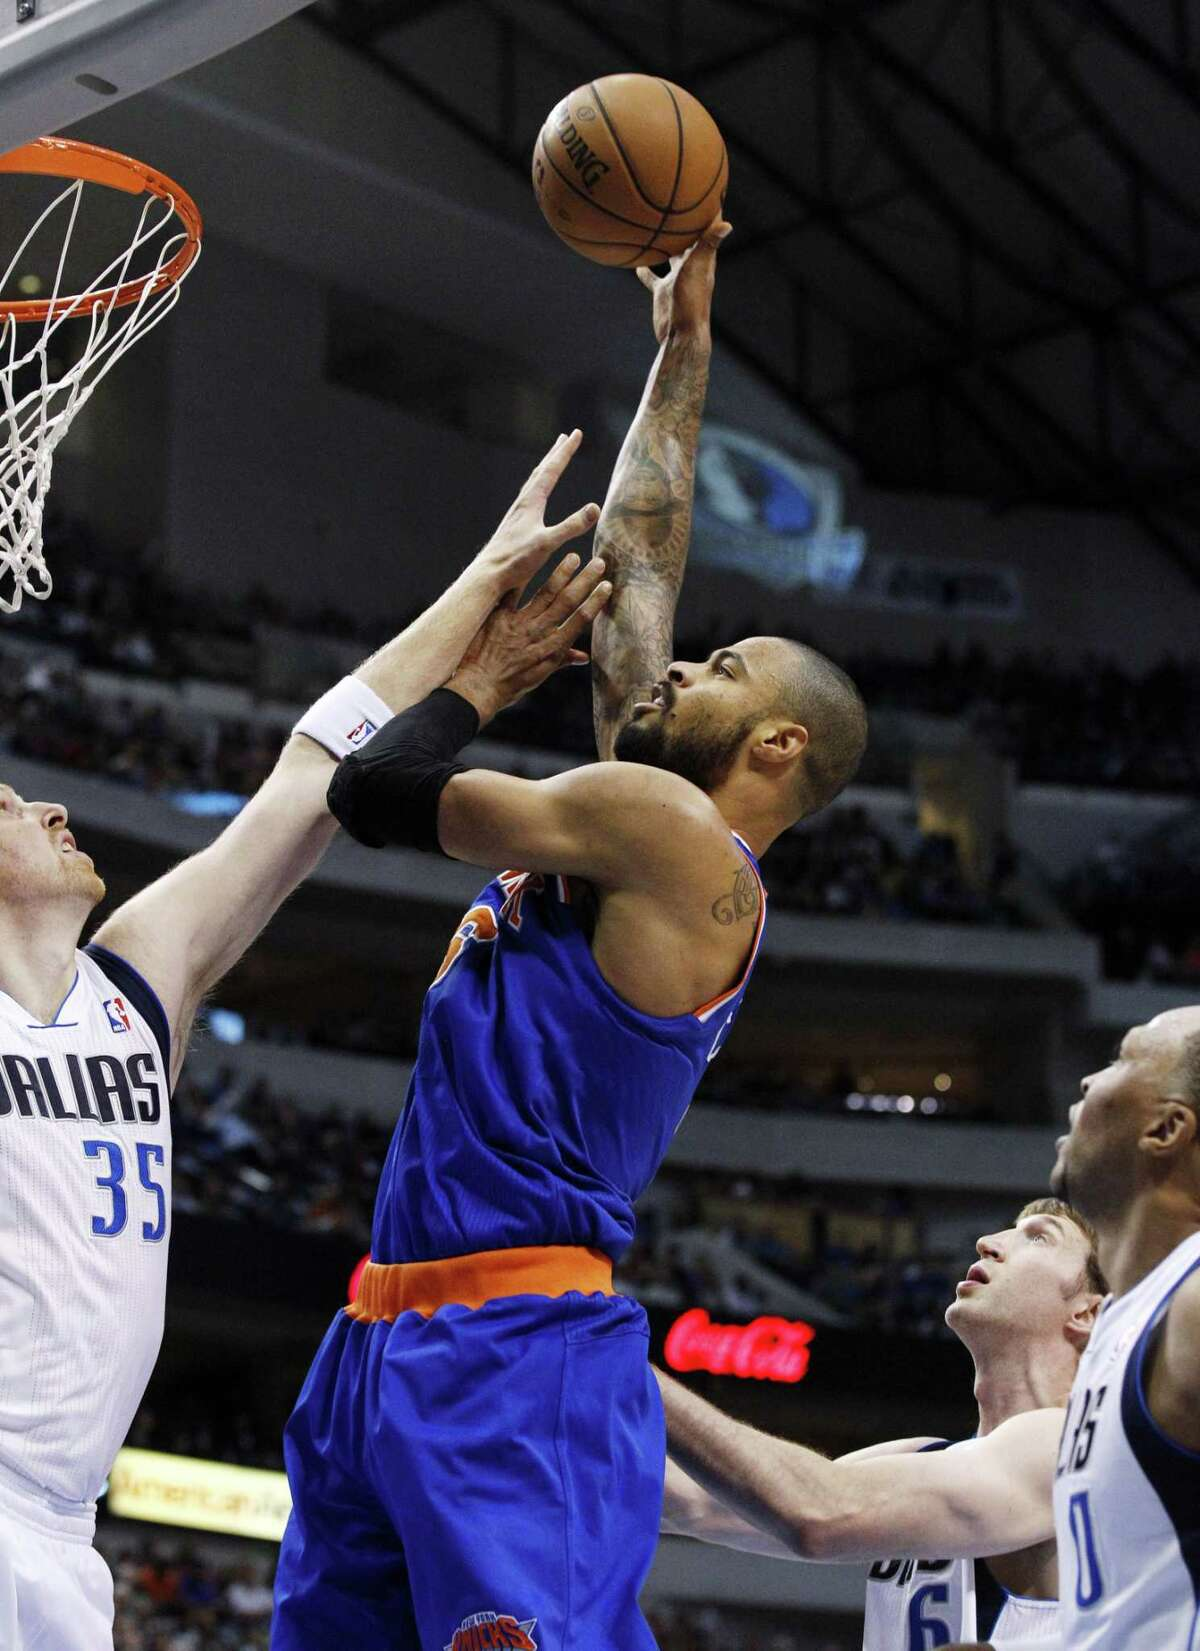 New York Knicks center Tyson Chandler takes a shot over Dallas Mavericks center Chris Kaman. Photo by The Associated Press